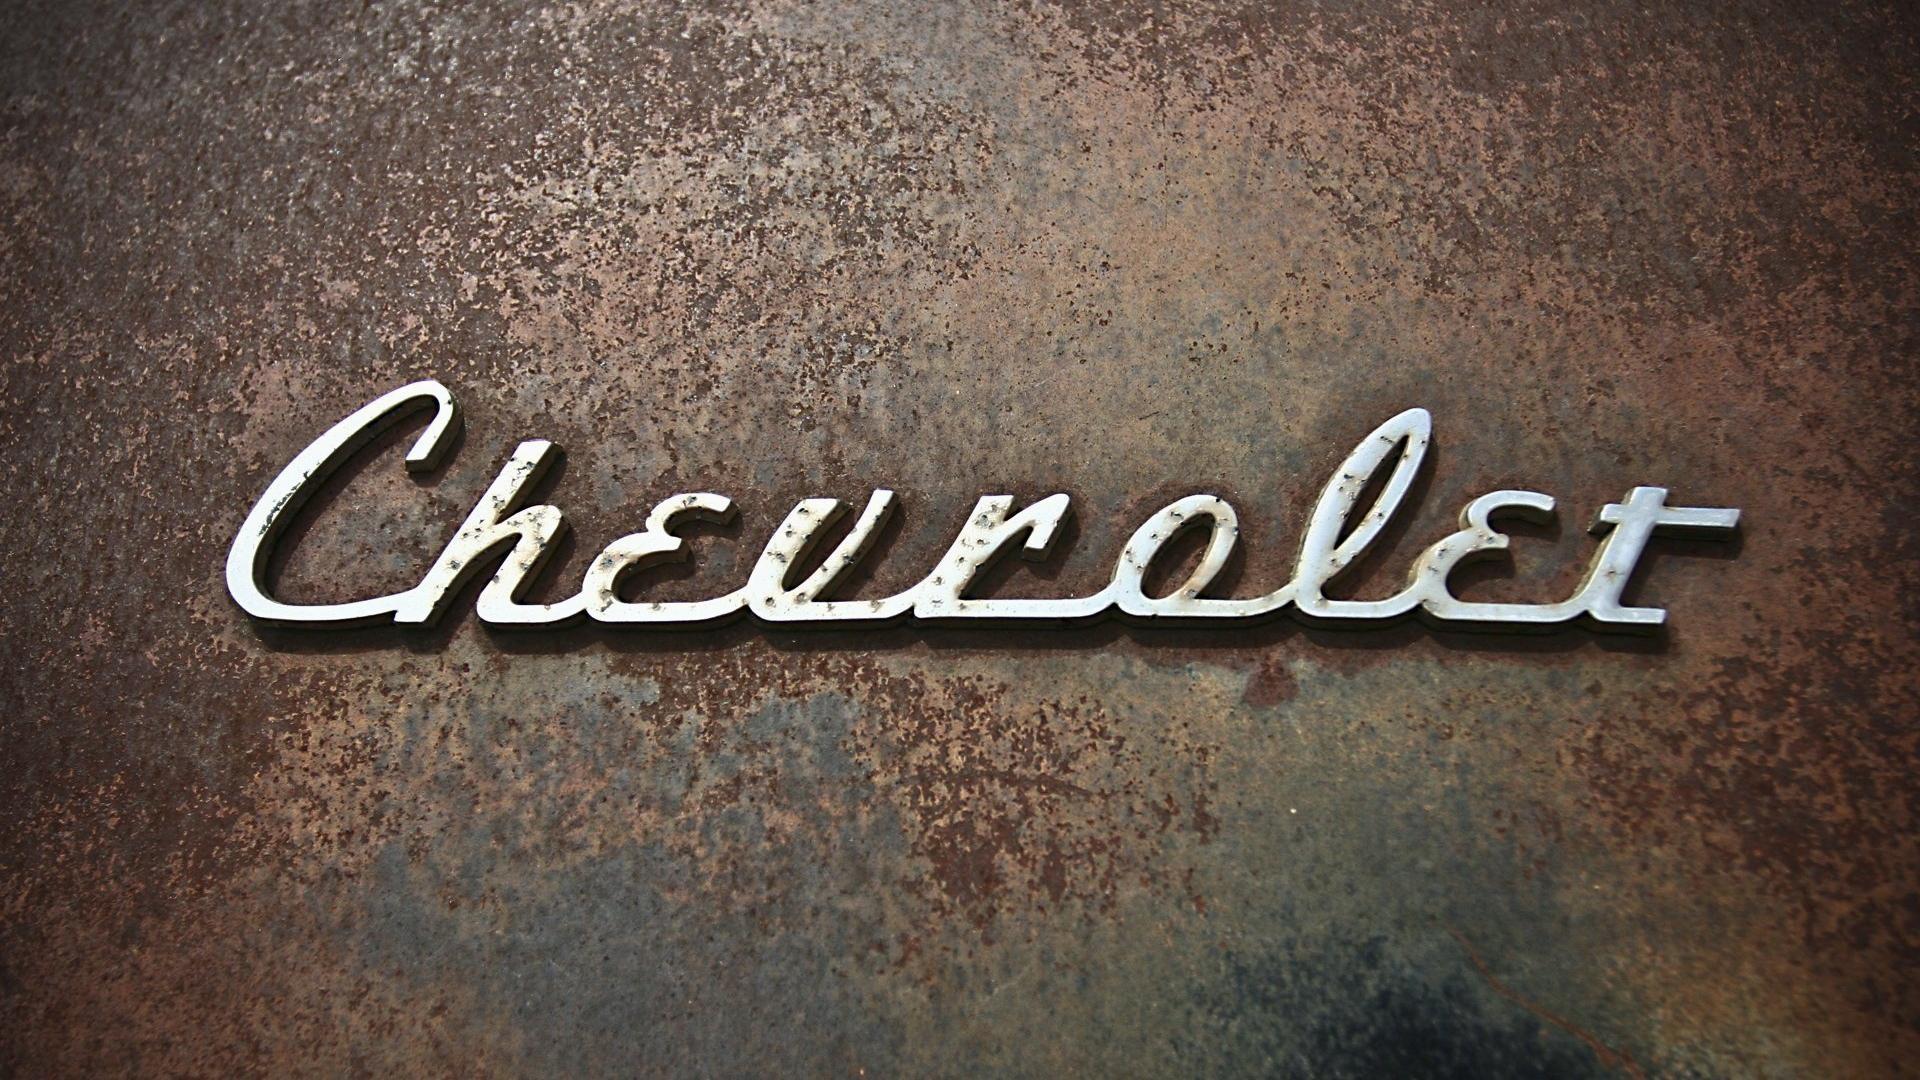 1920x1440 Chevy Logo Wallpaper 4377 Hd Wallpapers in Logos - Imagesci.com